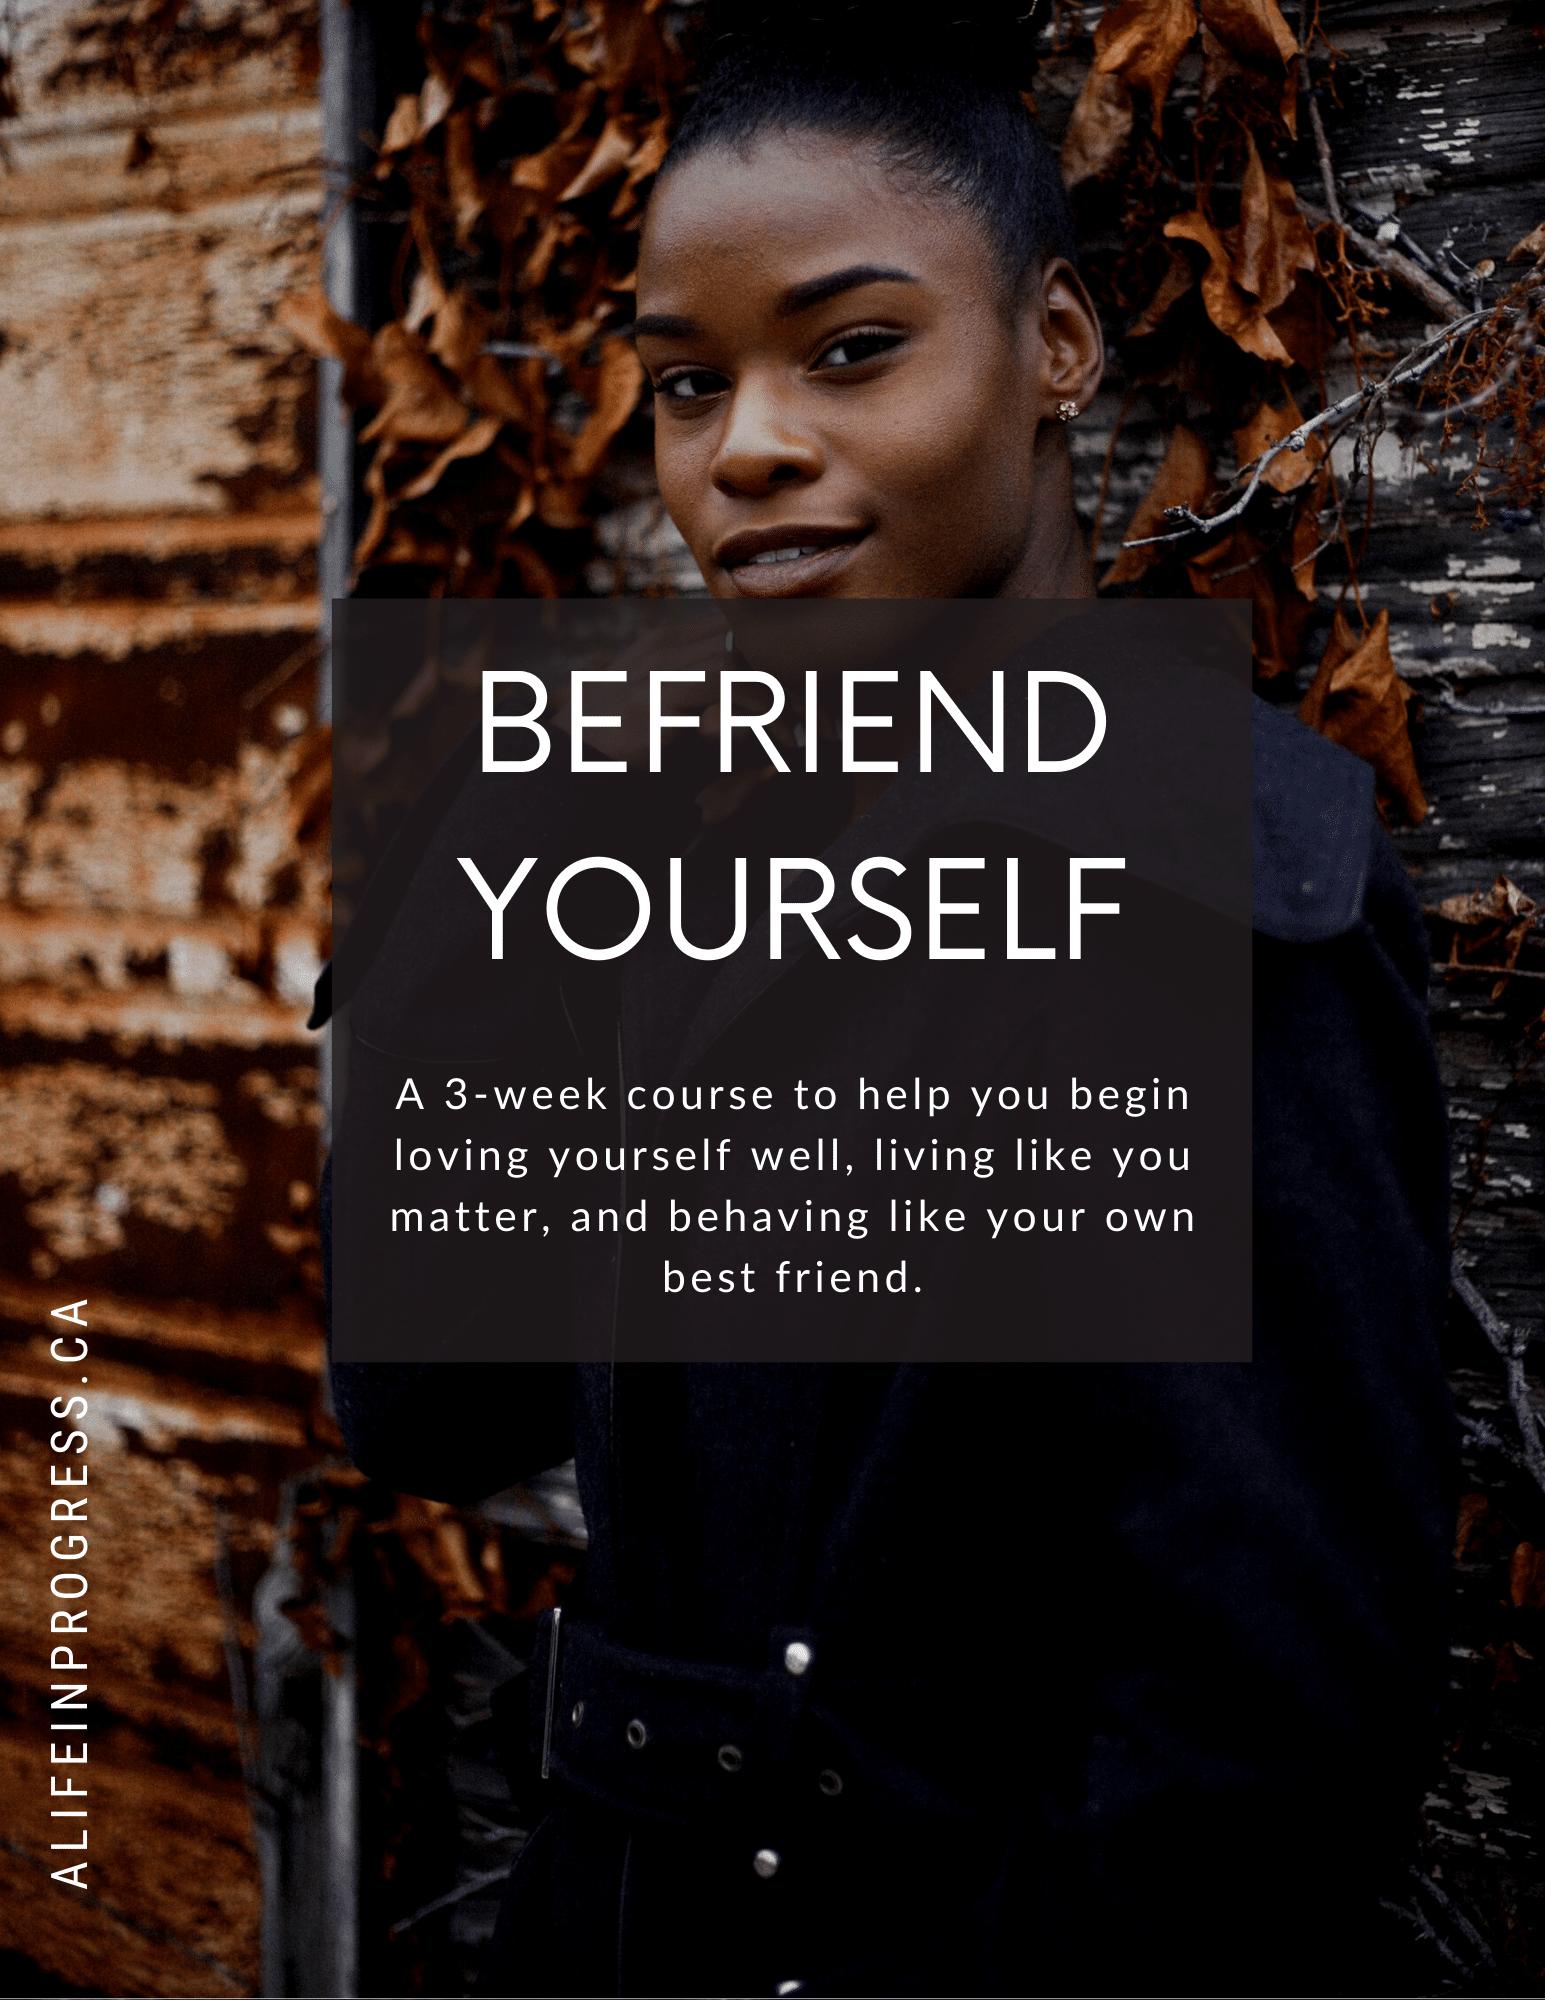 befriend yourself mini-course